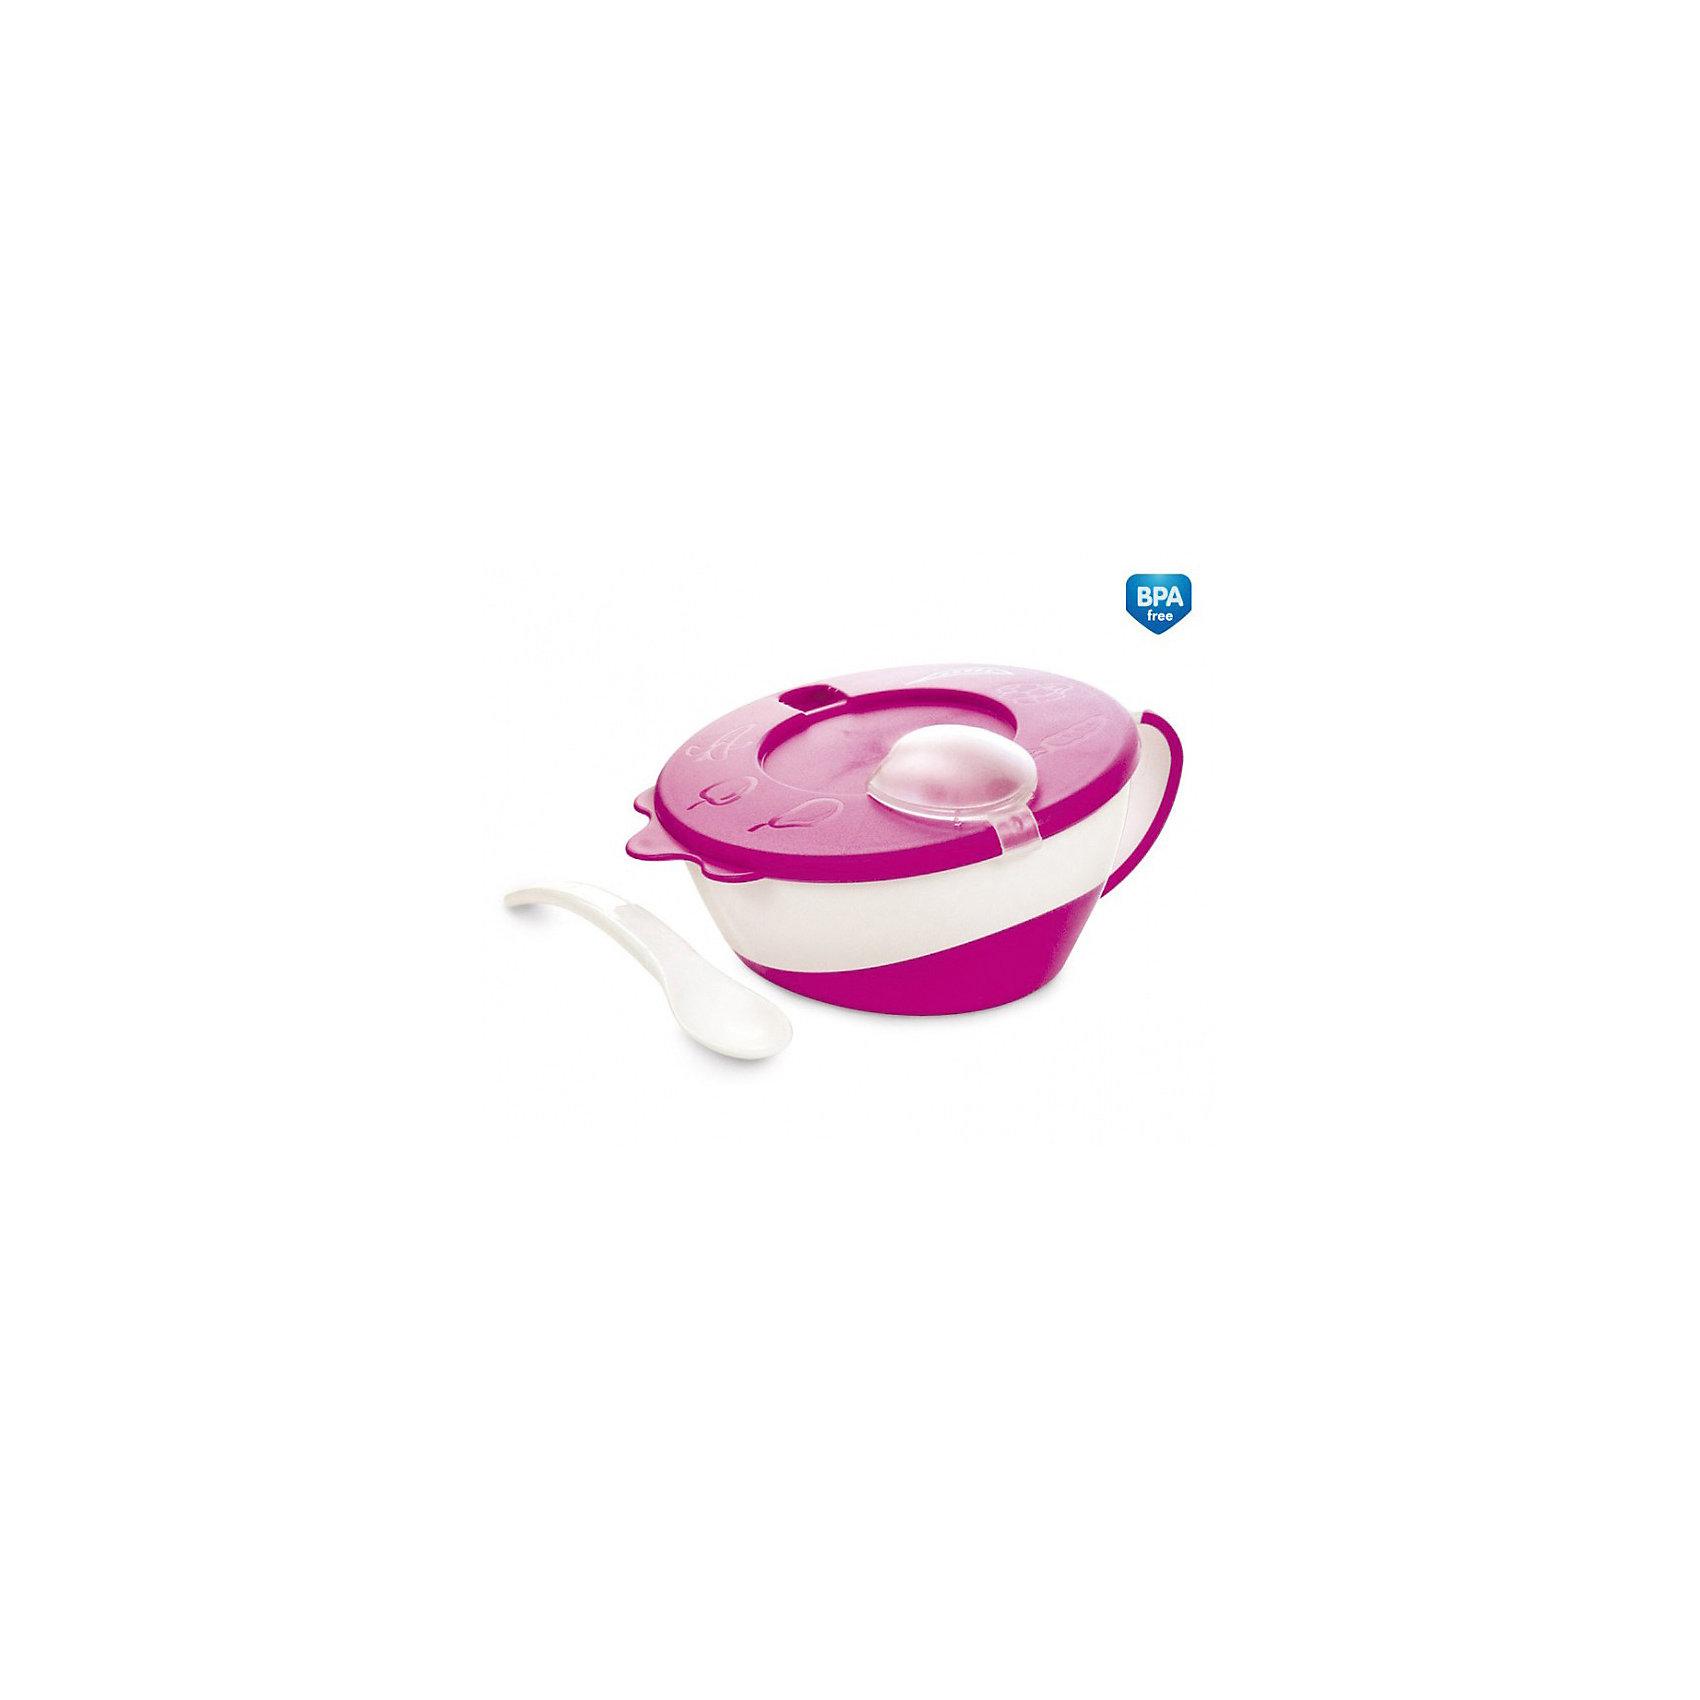 Canpol Babies Мисочка с ложкой и крышкой, Canpol Babies, розовый цена и фото